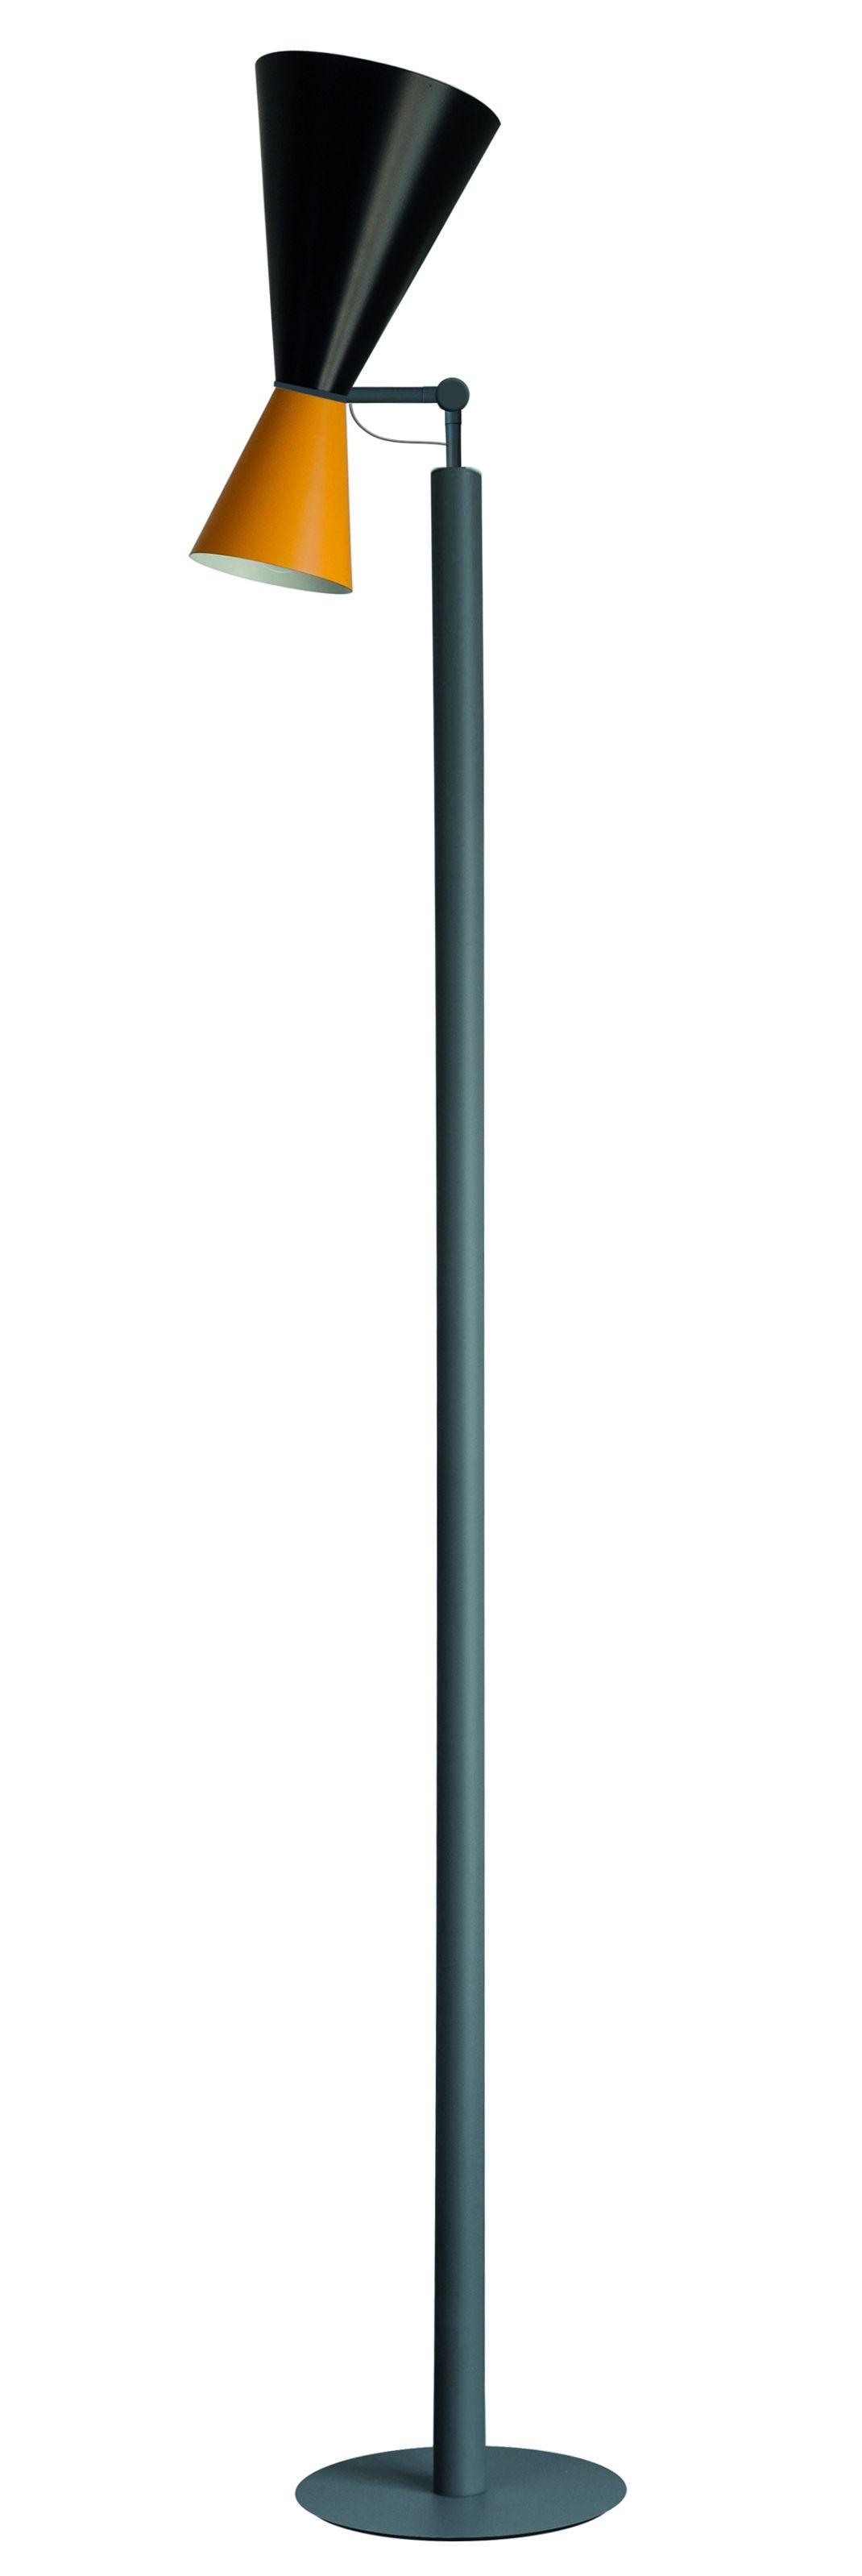 Lighting - Floor lamps - Parliament Floor lamp - / Le Corbusier - Reissue 1964 by Nemo - Black & yellow / Grey leg - Metal